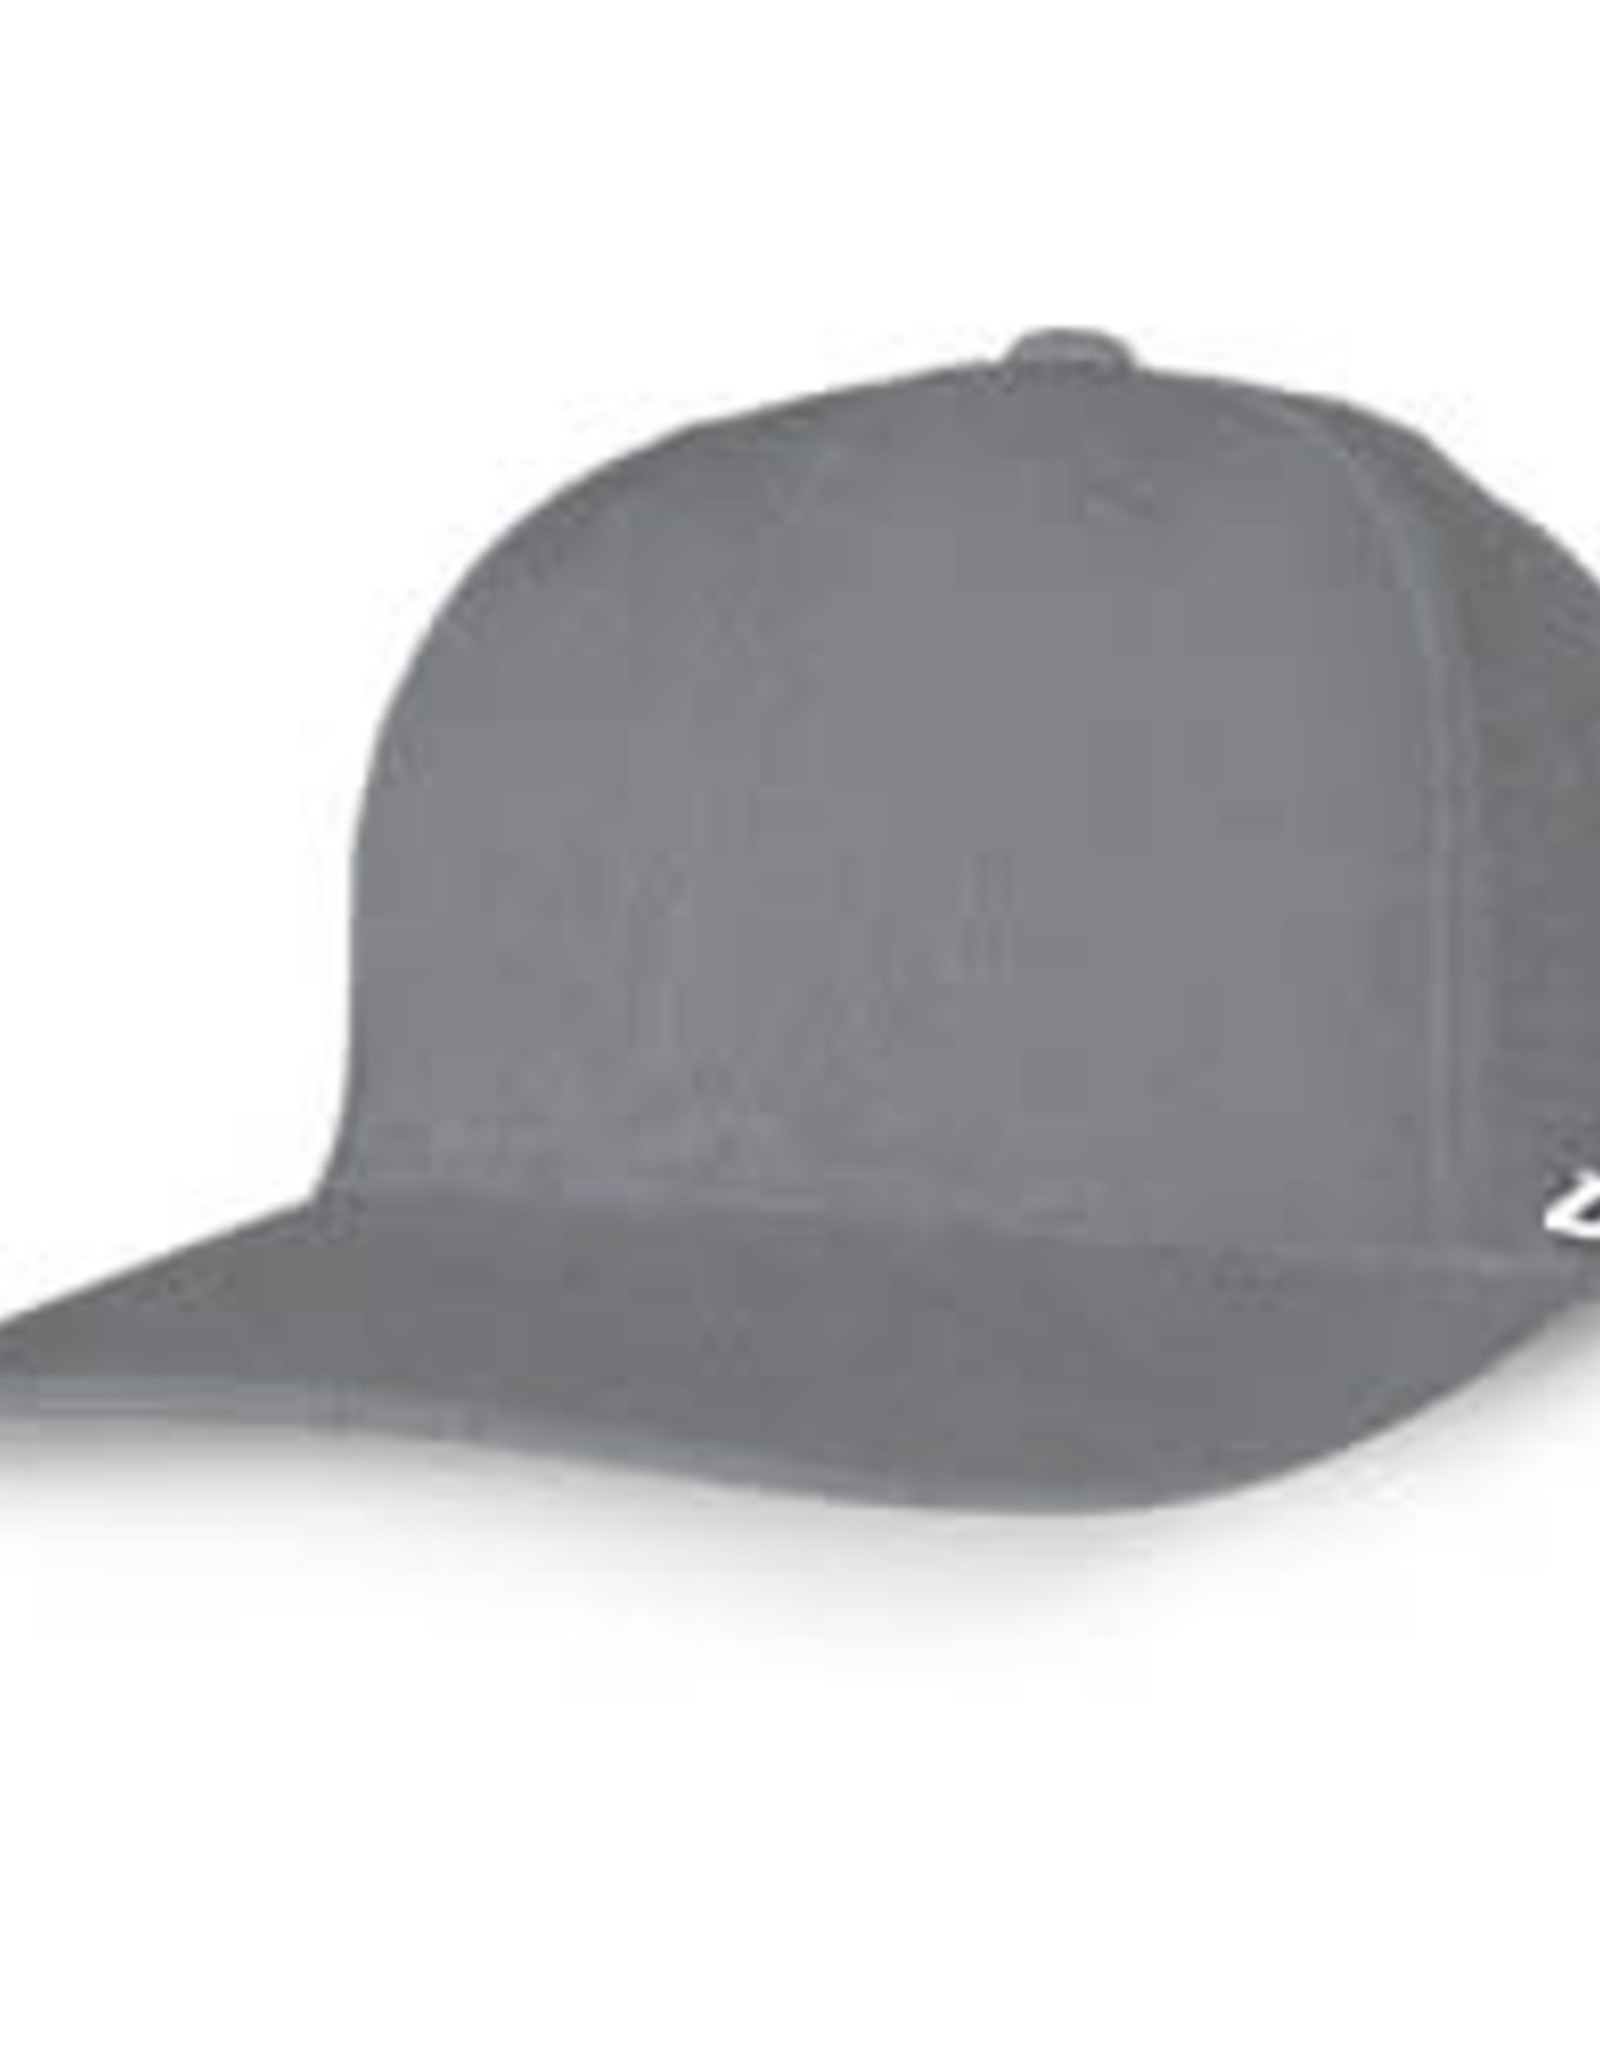 C4817 TEAM YT SNAPBACK ADJUSTABLE CAP DARK GREY OSFA